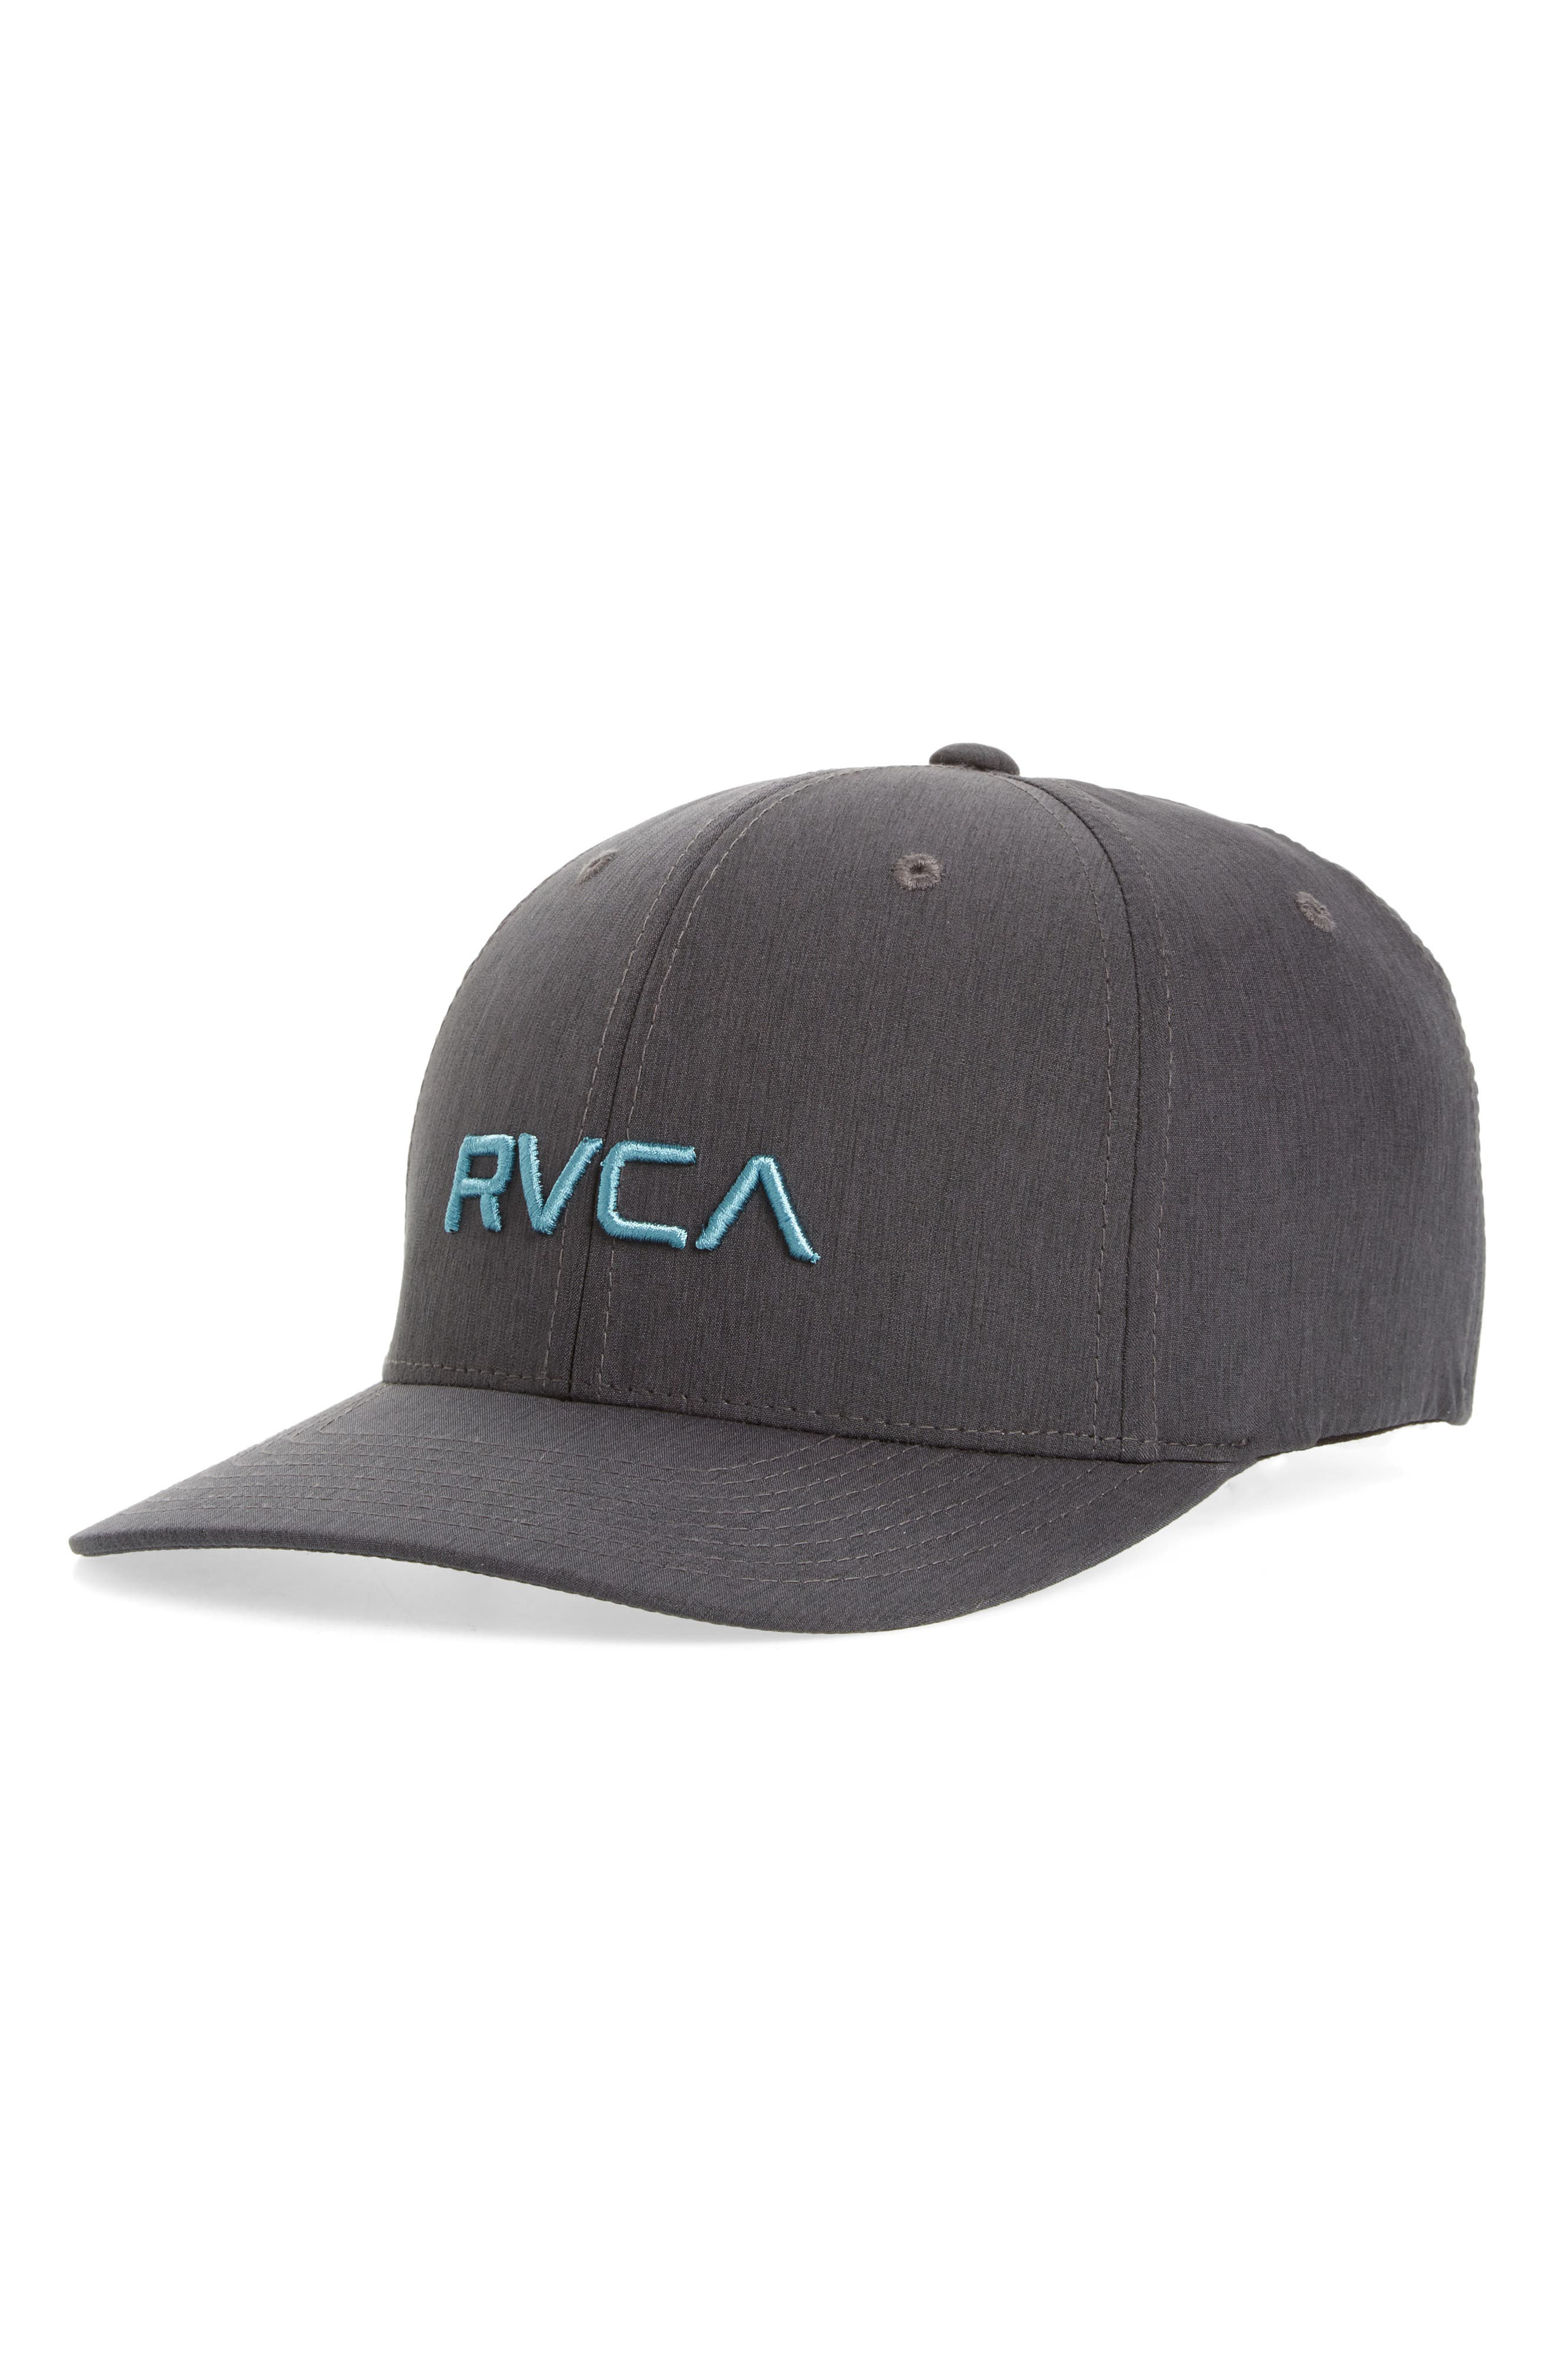 b0efea257c9 RVCA Women s   Men s Clothing   Accessories